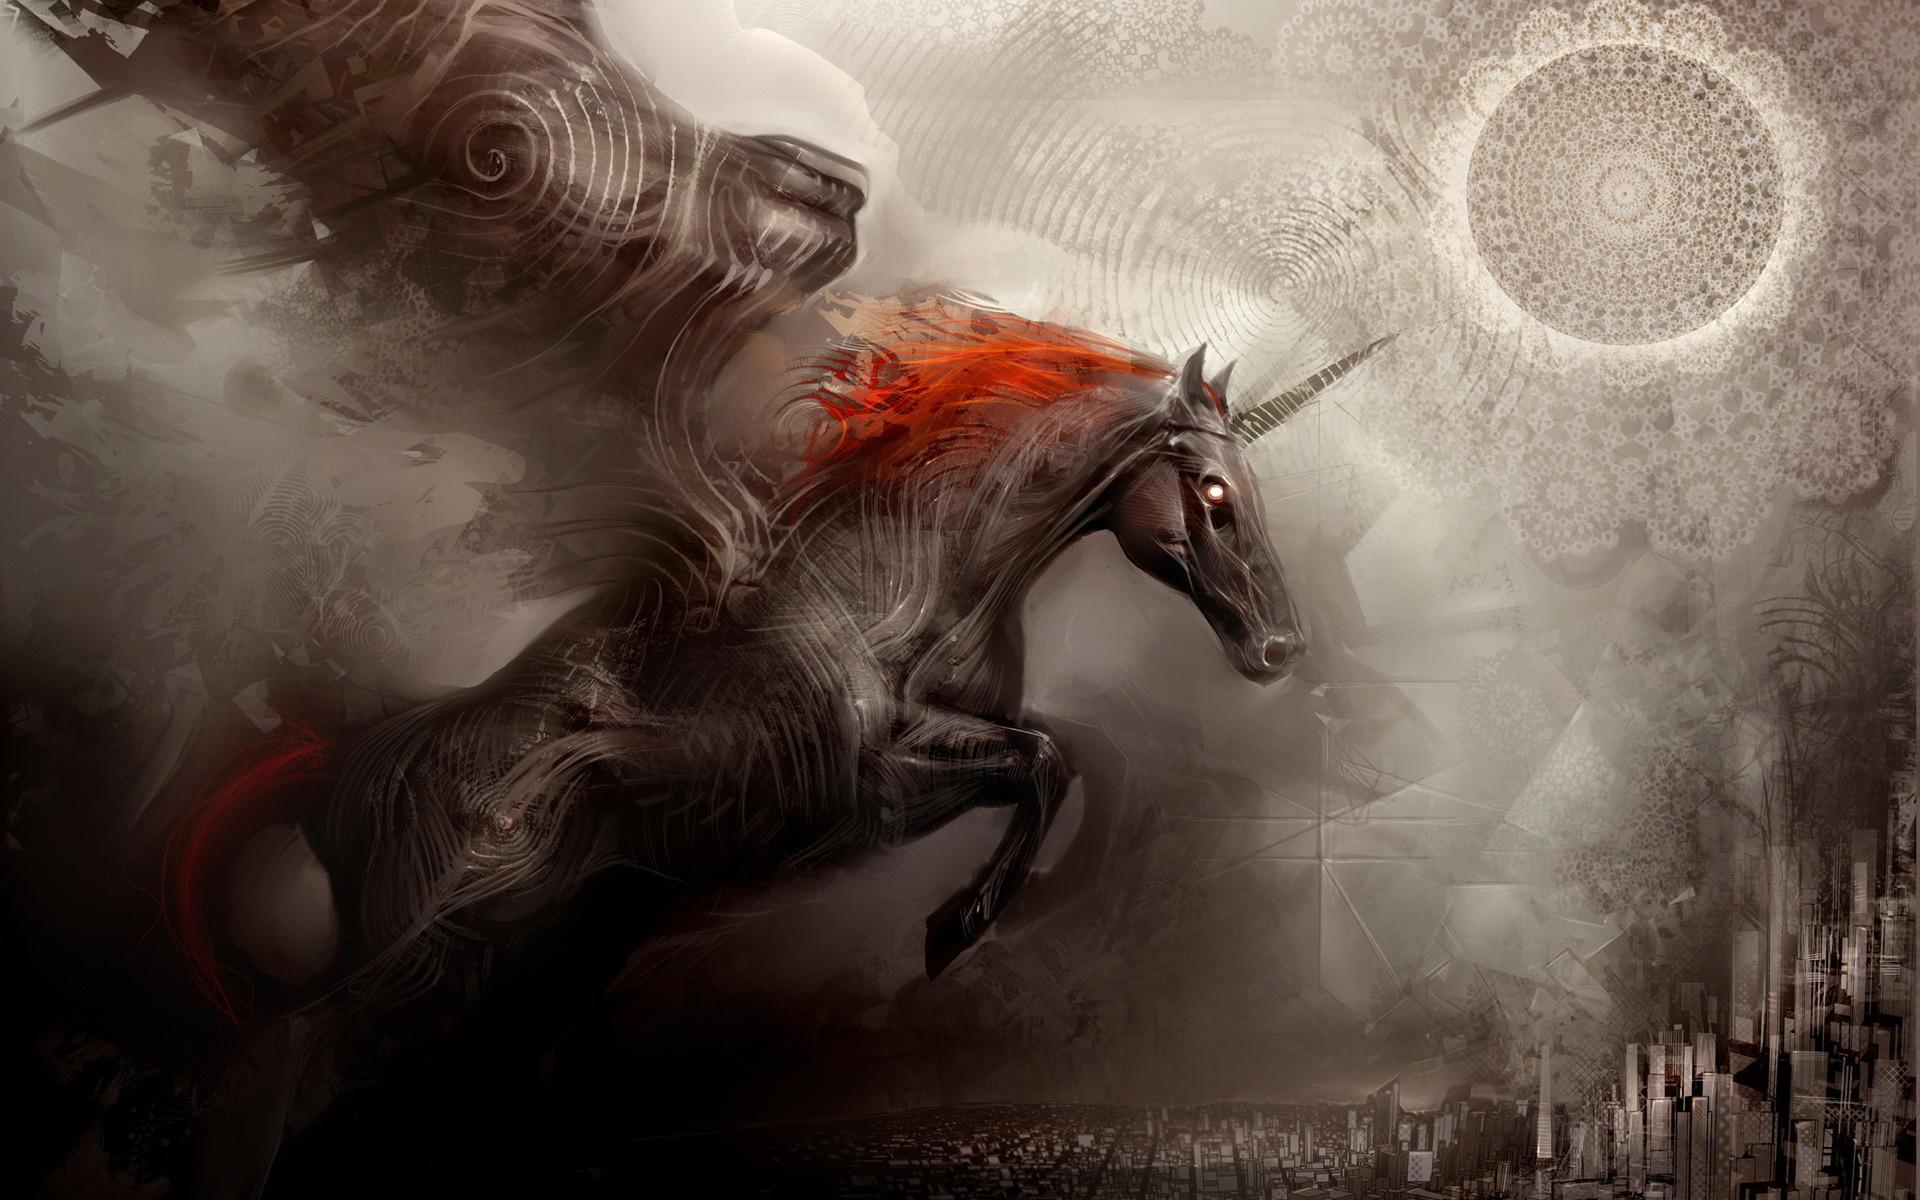 Good Wallpaper Horse Warrior - beautiful-unicorn-1920x1200-wide-wallpapers-net  2018_154624.jpeg